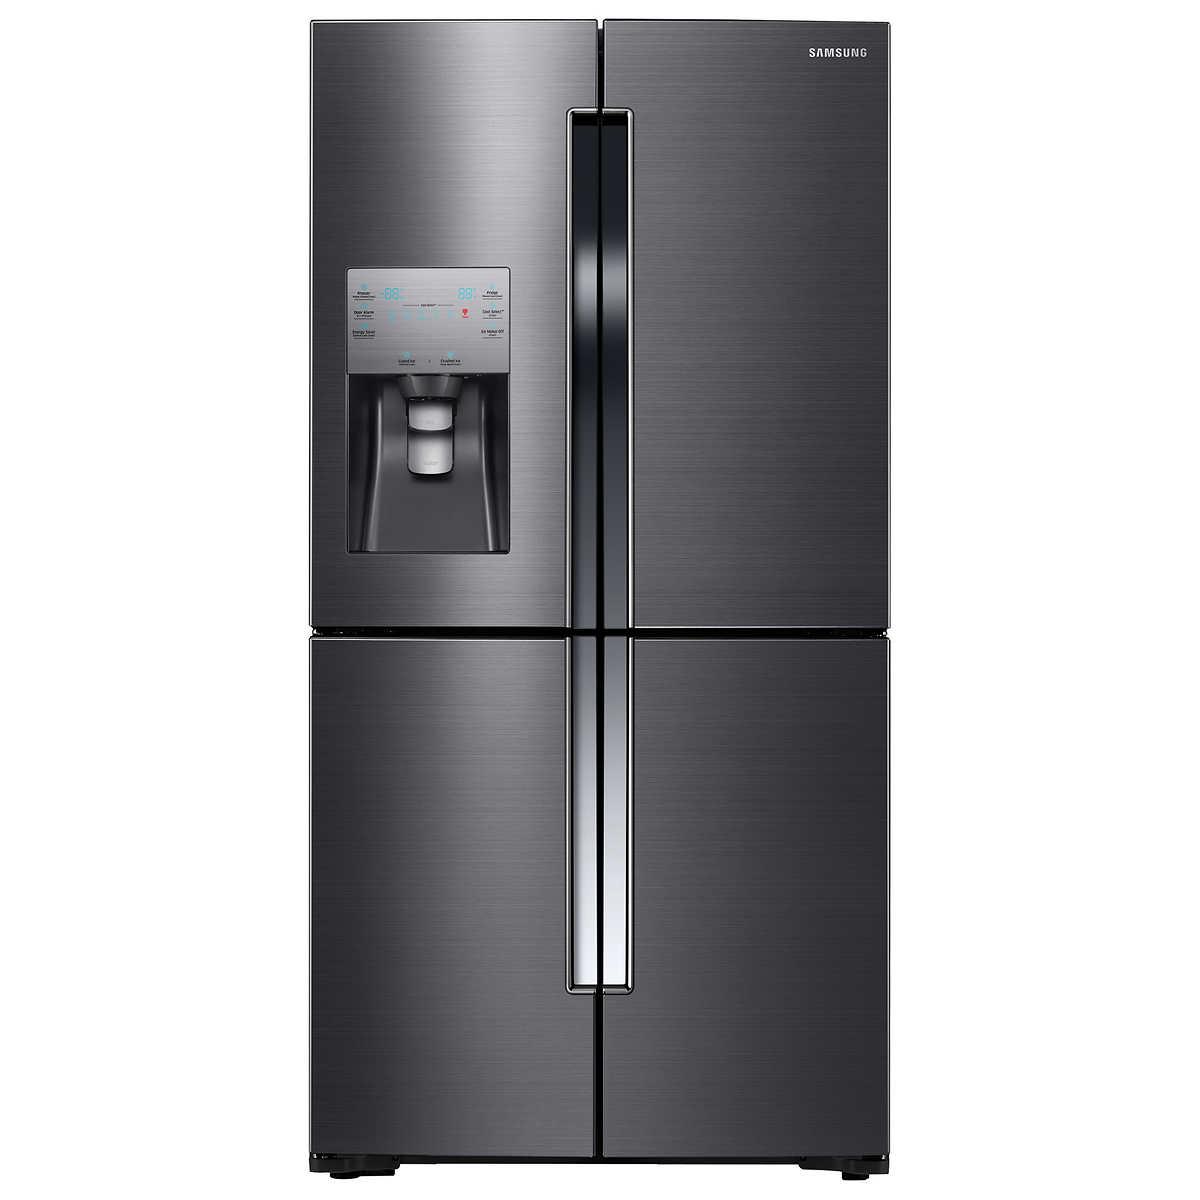 Counter Depth Refrig Samsung 23cuft 4 Door Flex Counter Depth Refrigerator With